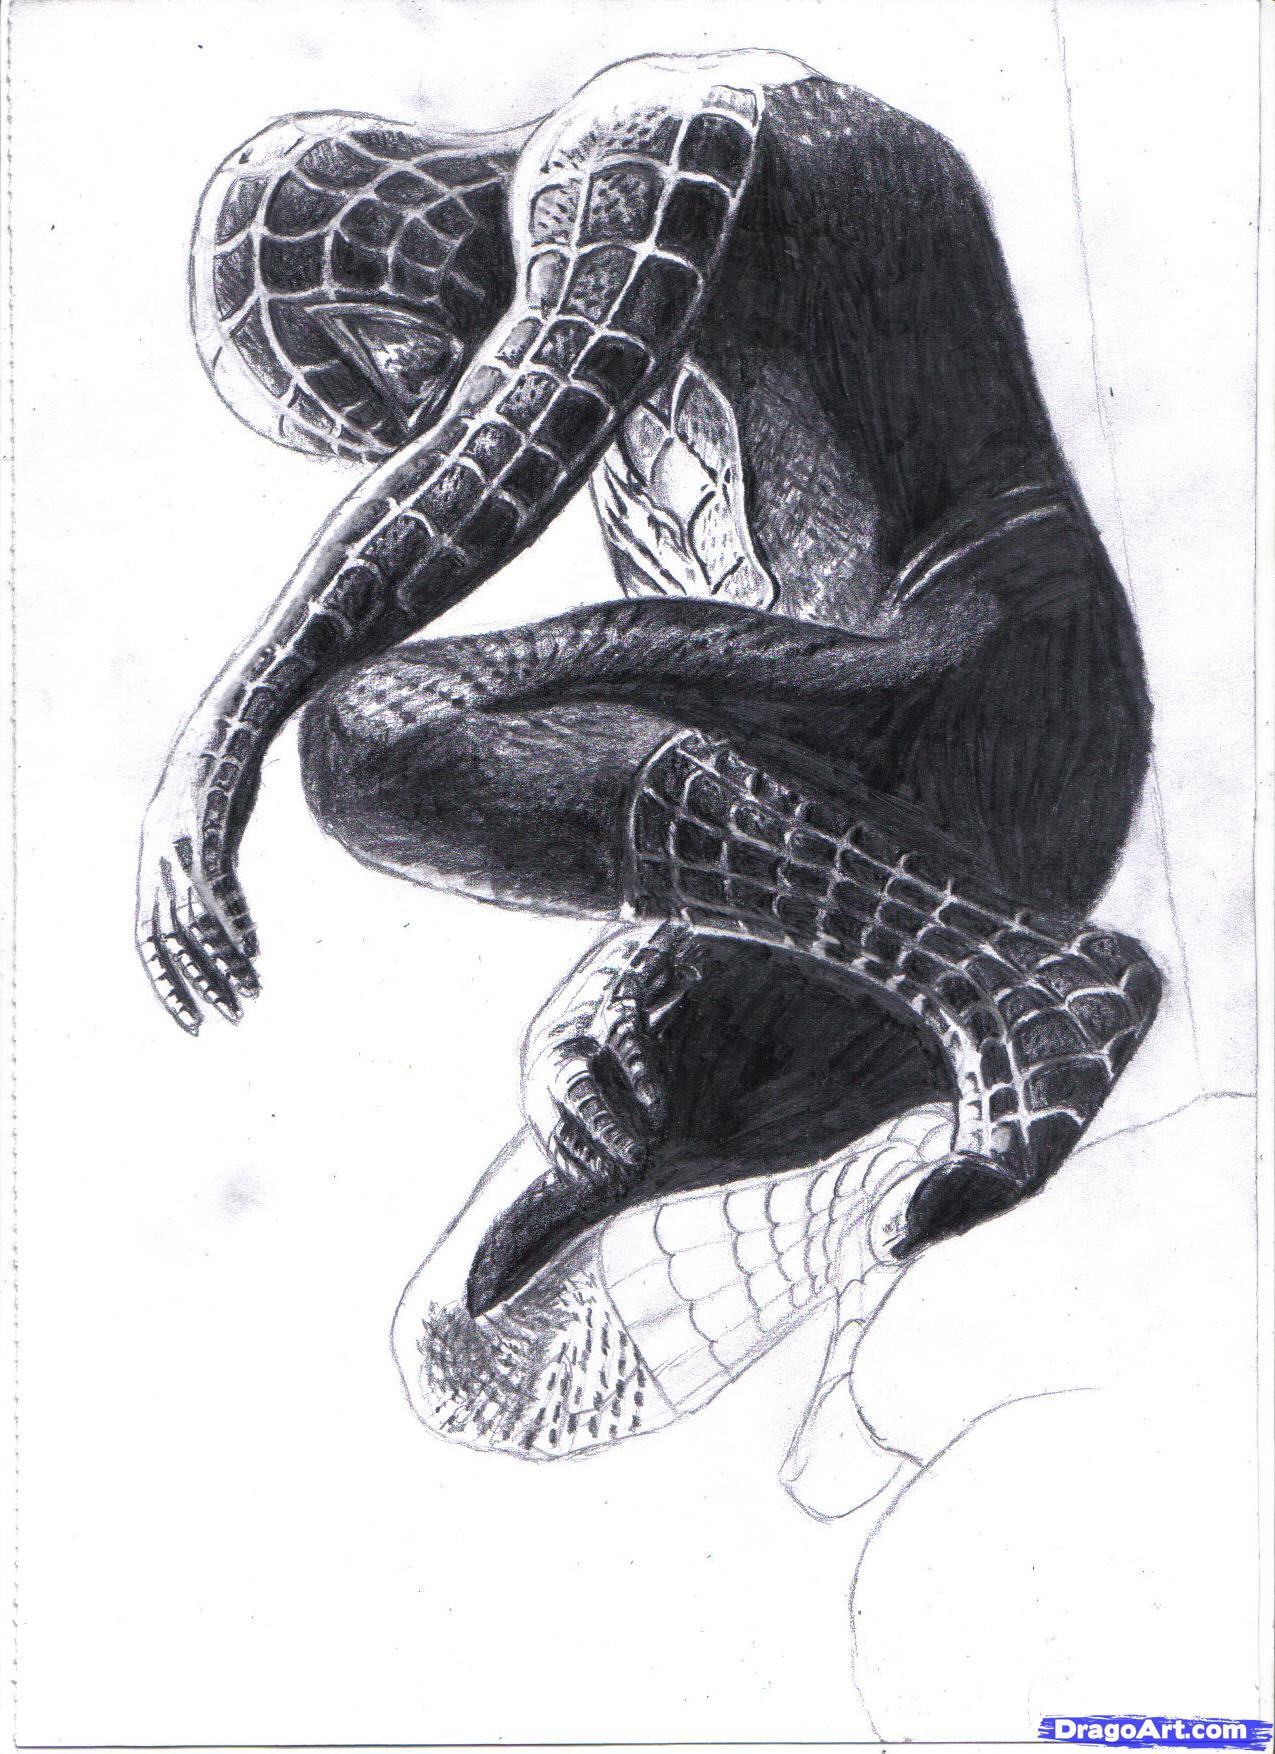 Drawn spiderman pencil sketch Black White Spiderman Black Step